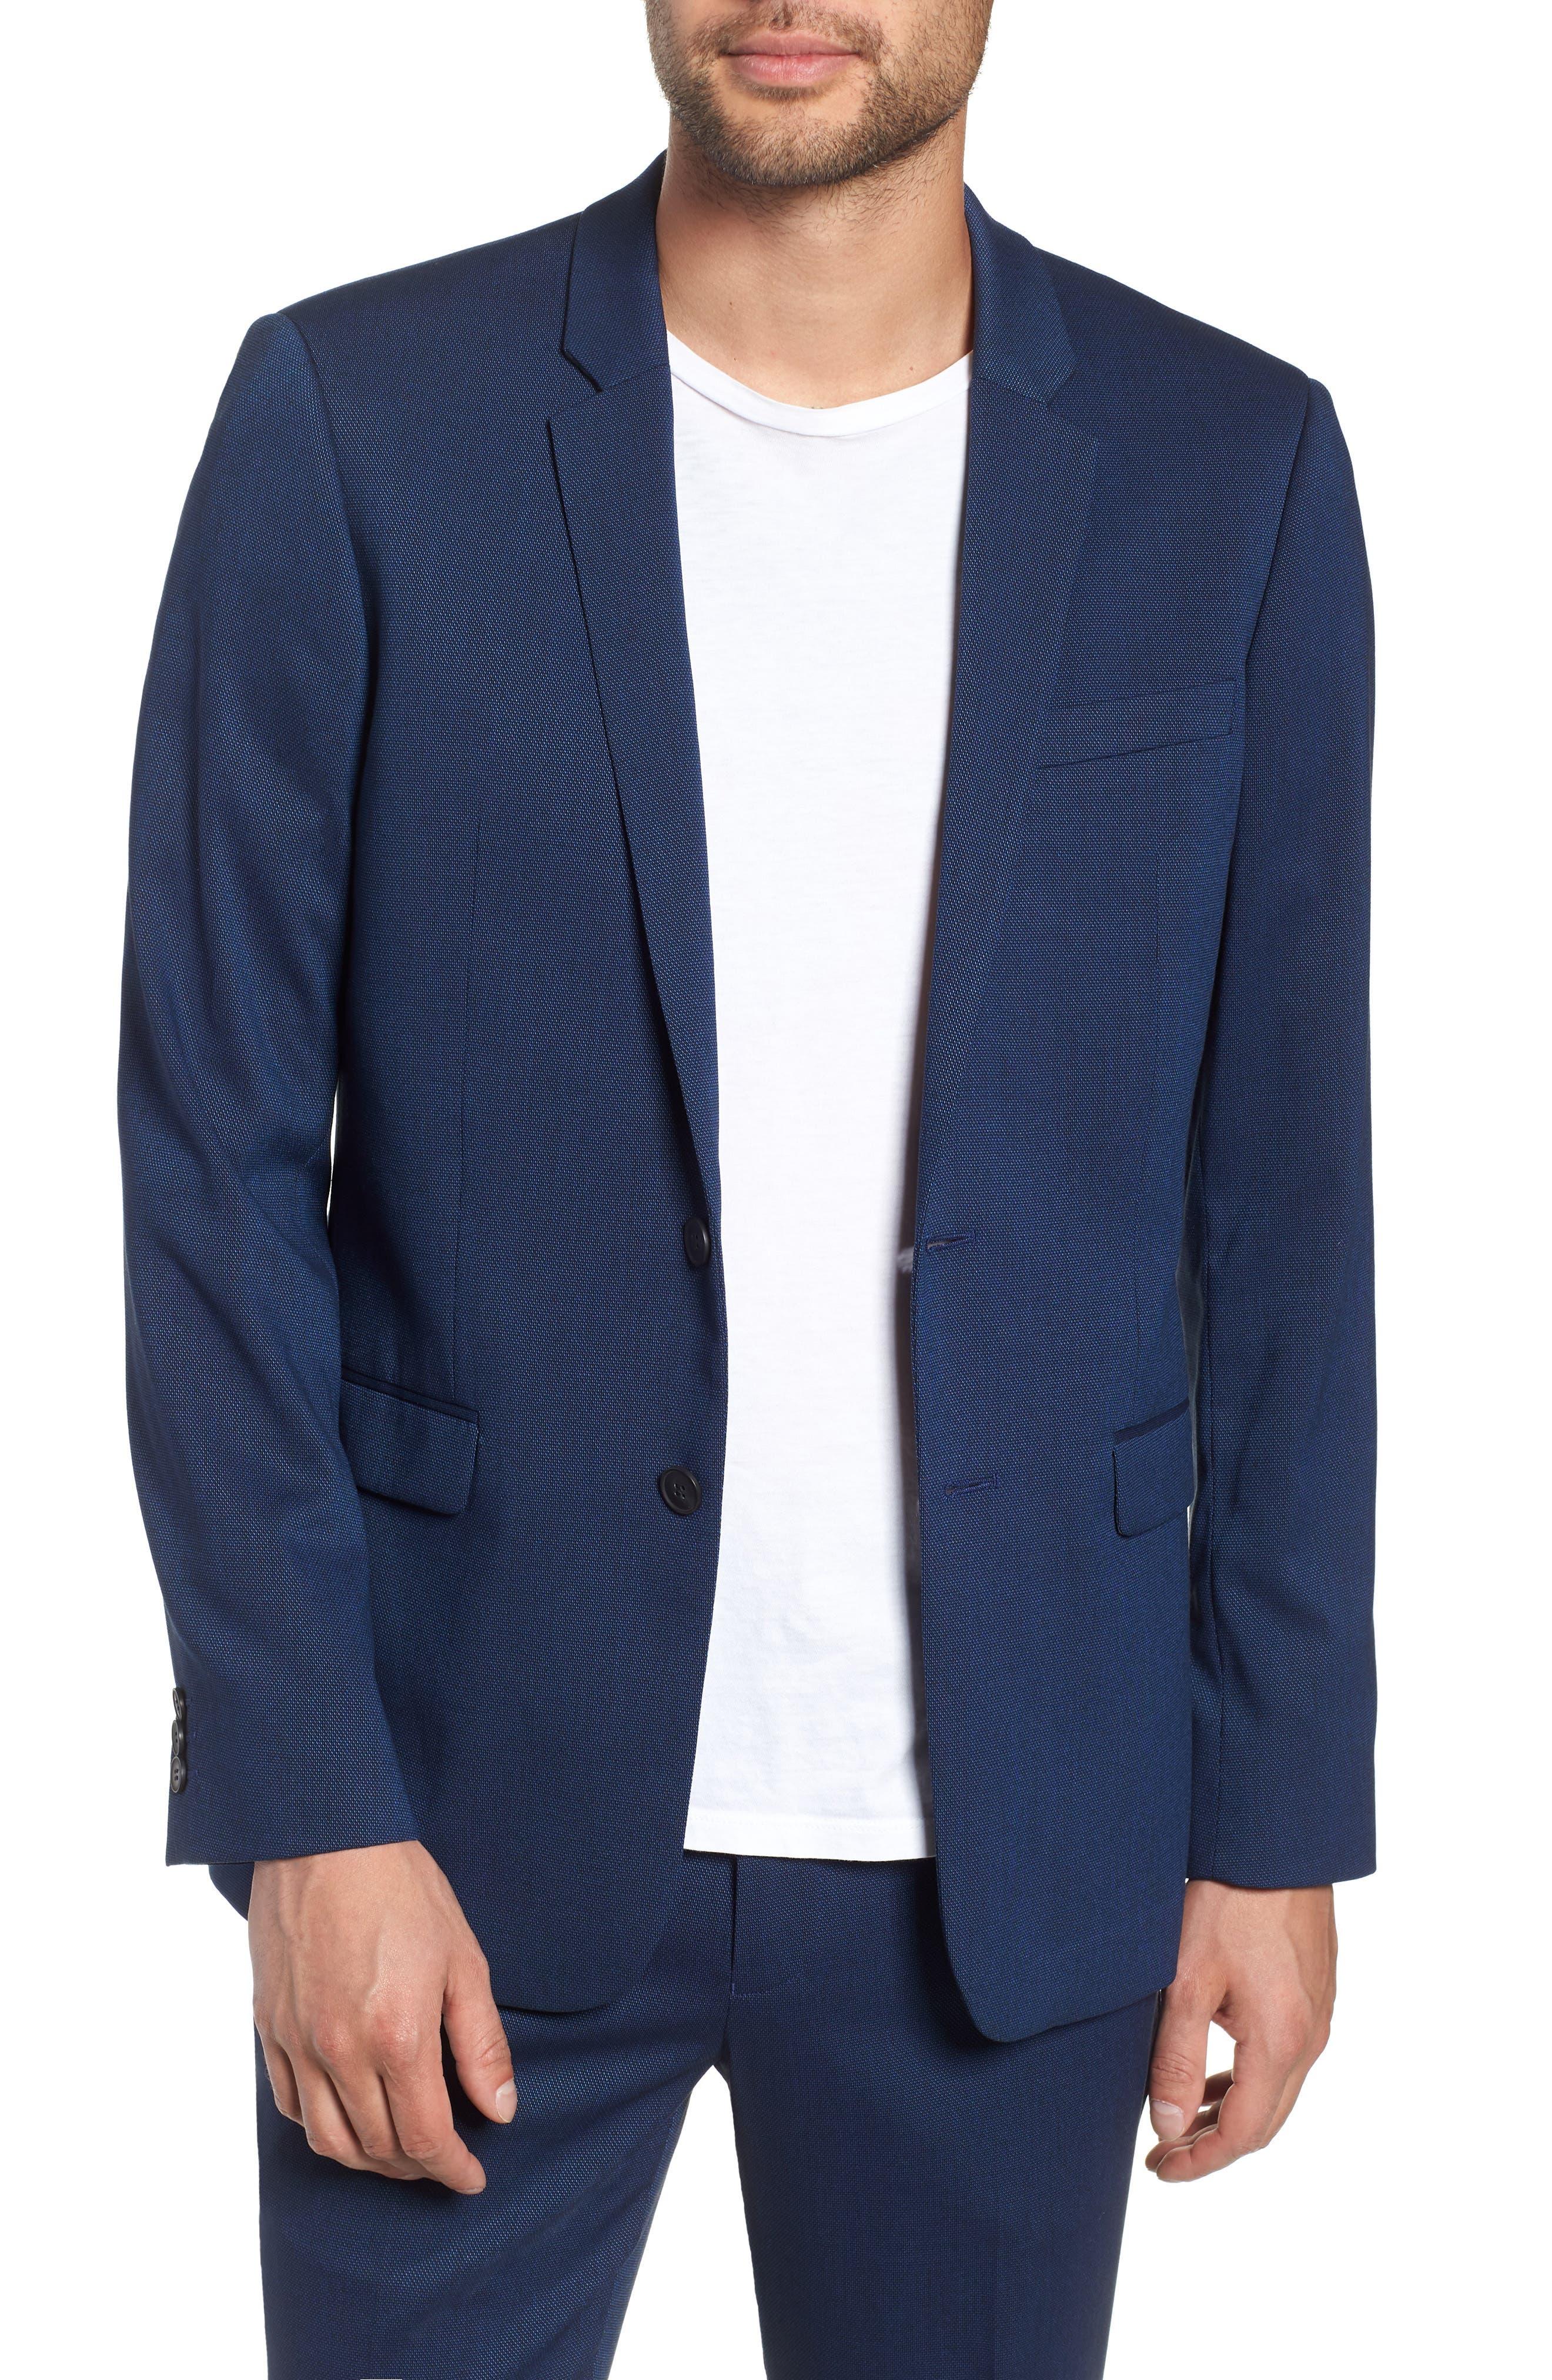 Image of TOPMAN Skinny Fit Suit Jacket